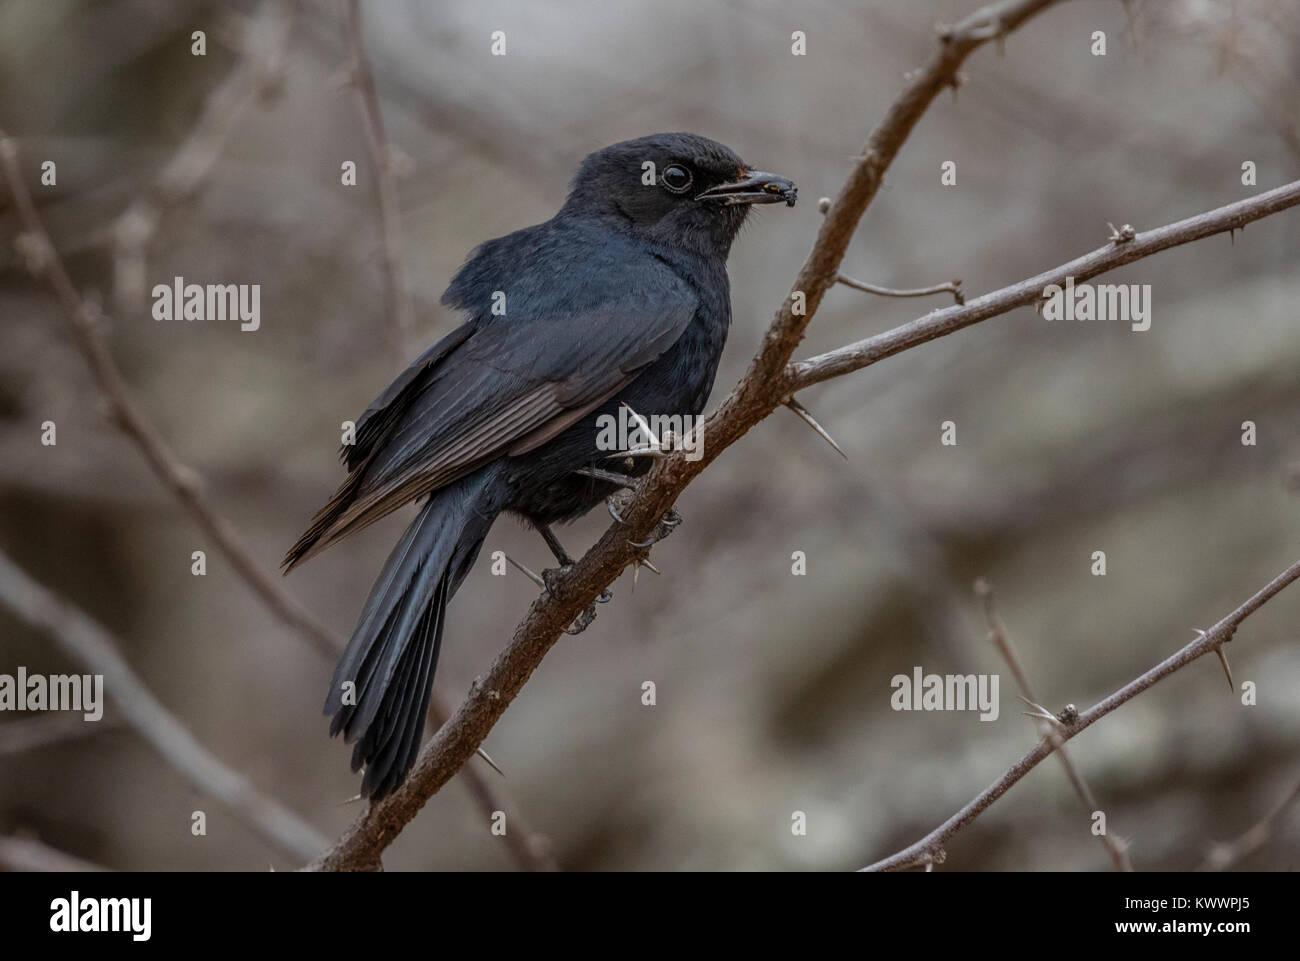 Southern Black Flycatcher (Melaenornis pammelaina), - Stock Image